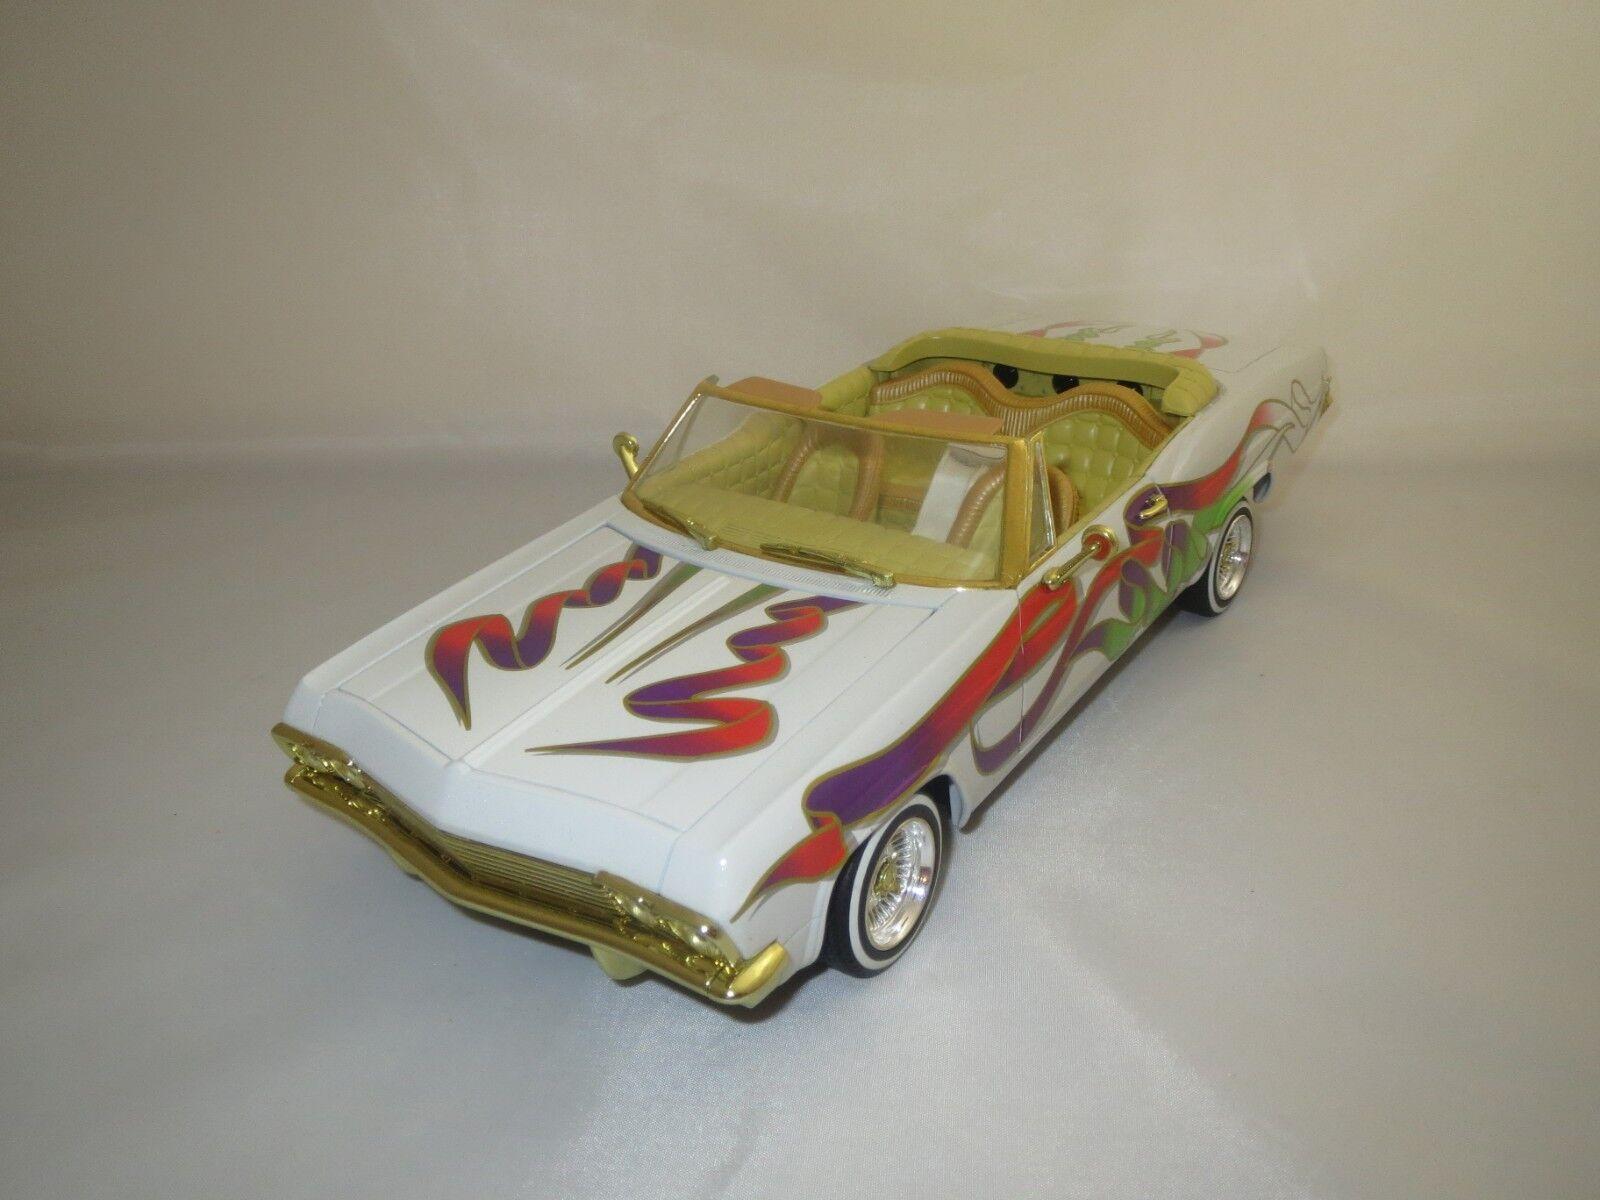 Hot Wheels Mattel Chevrolet Impala  1965  1 18 sin embalaje